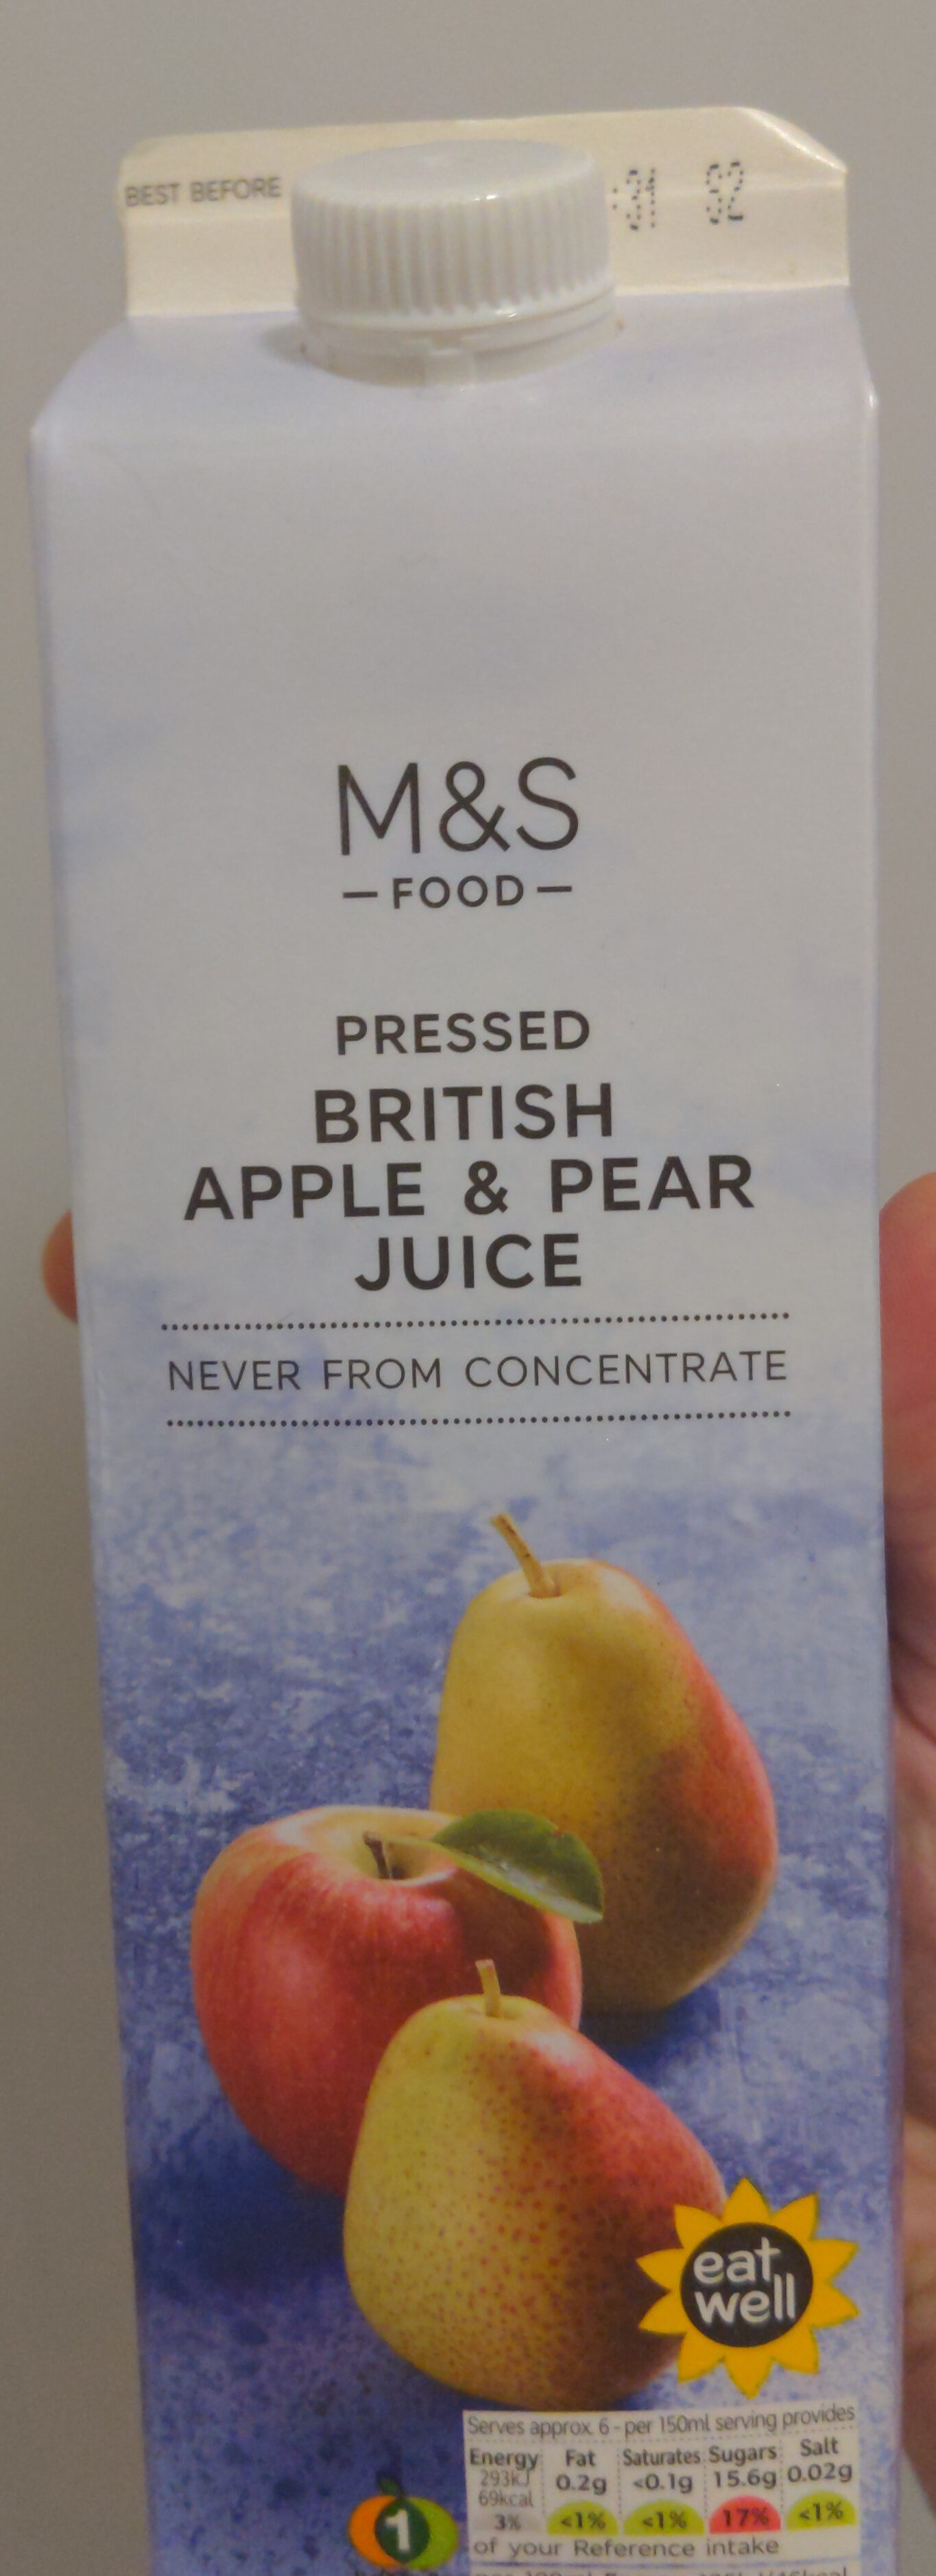 Pressed British Apple & Pear Juice - Product - en